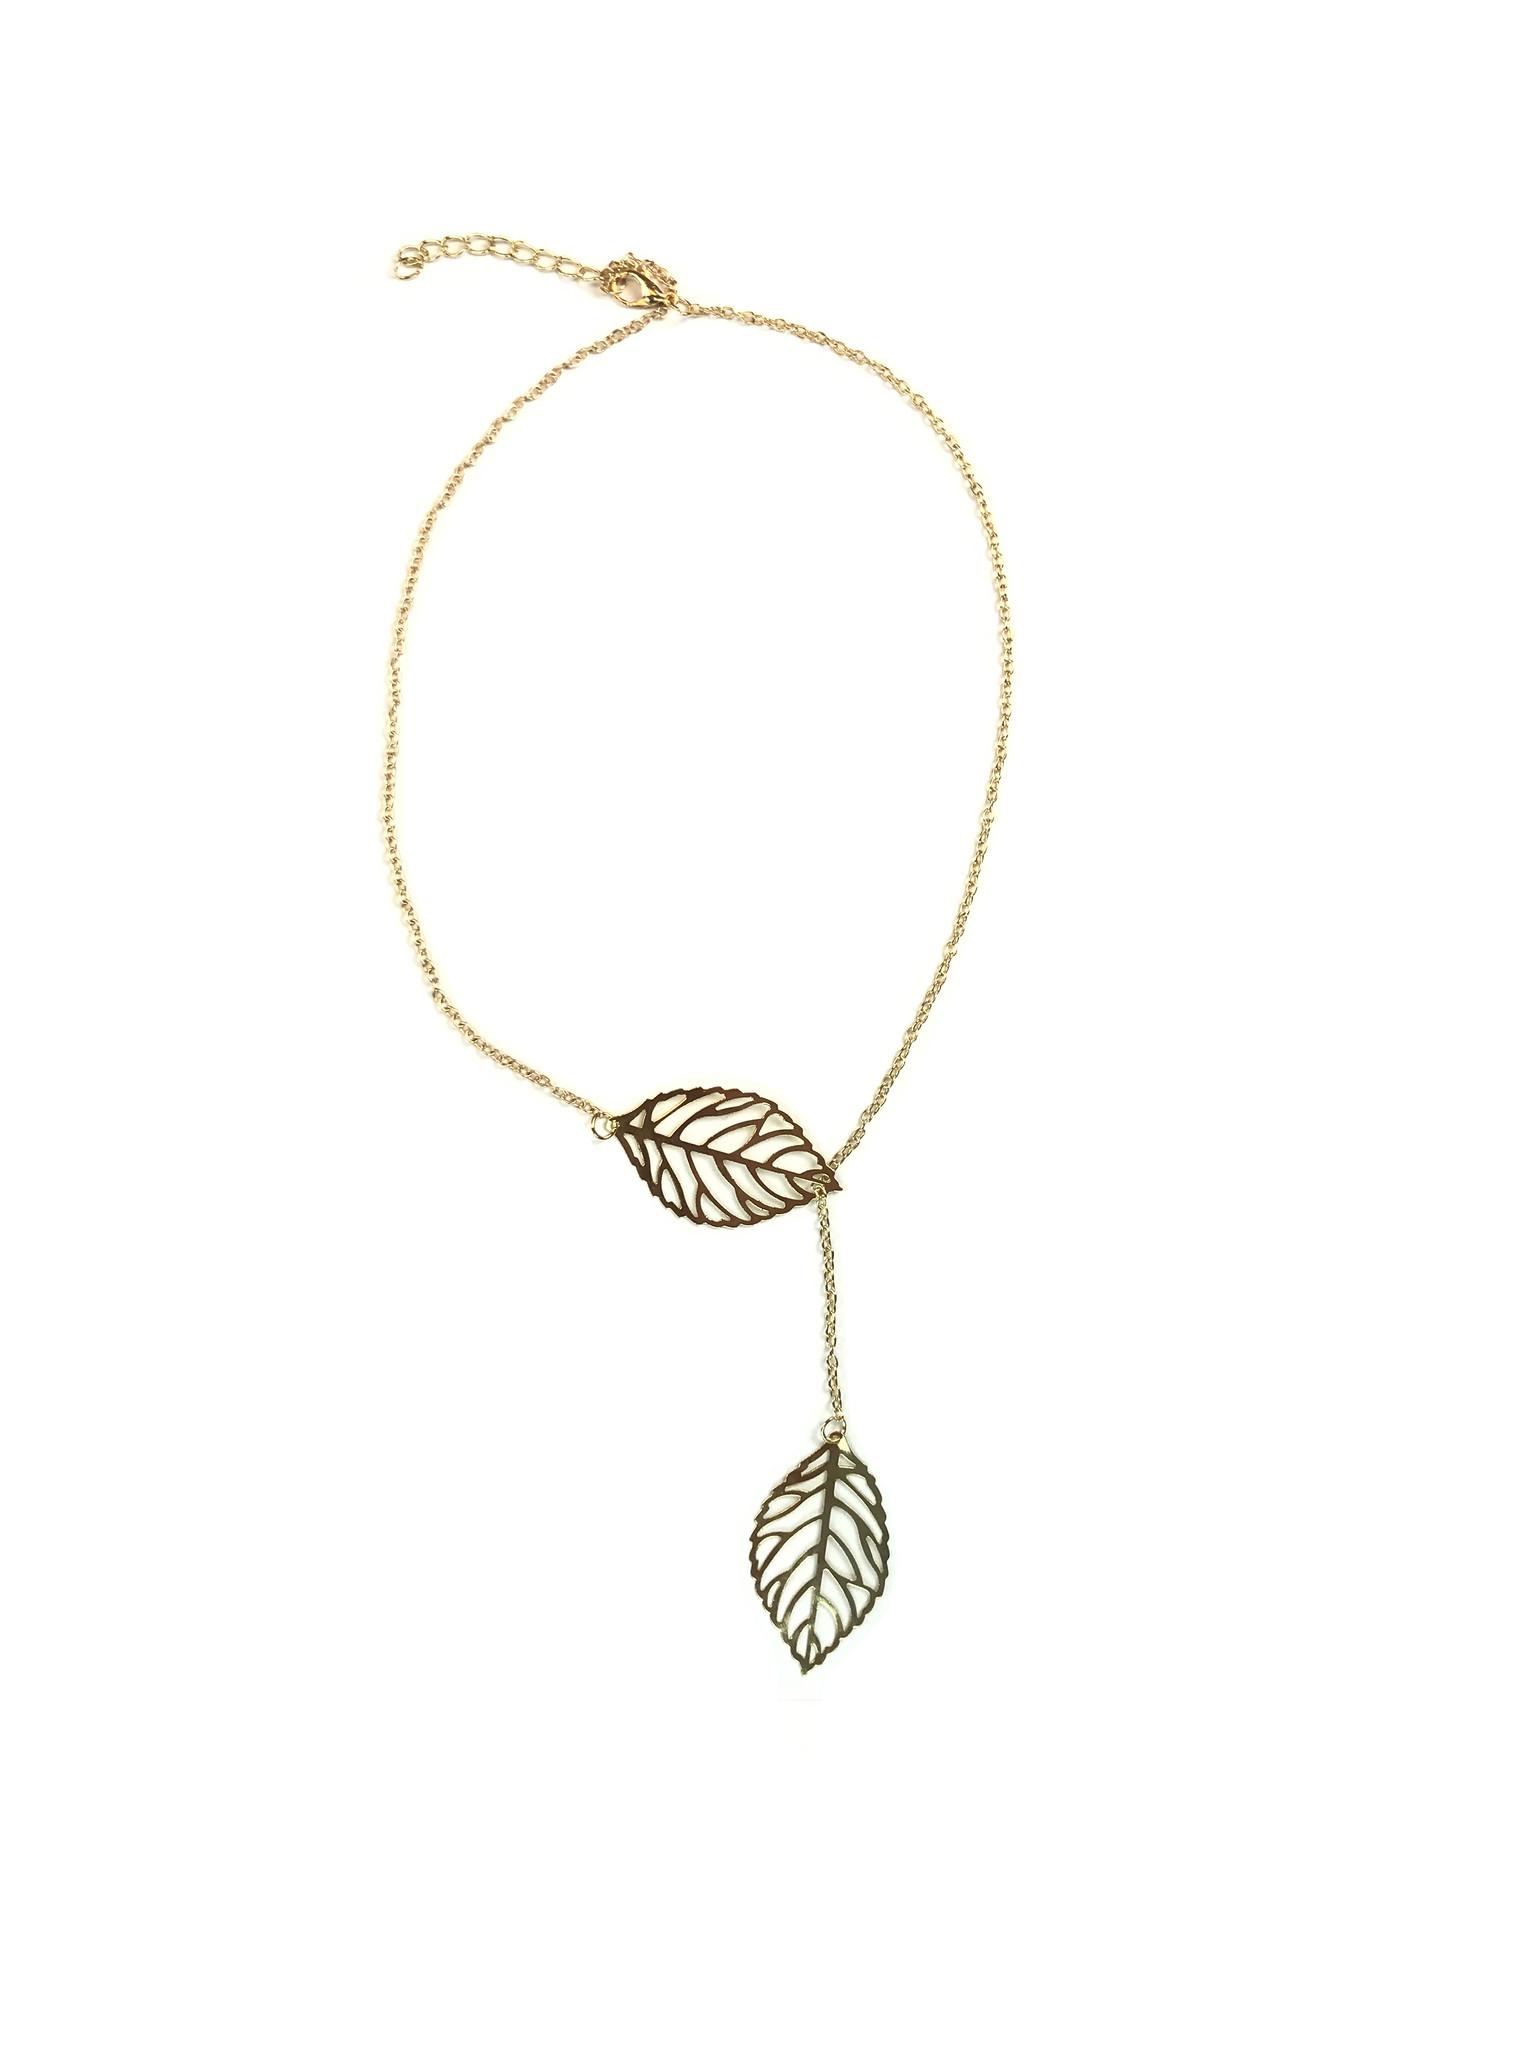 Joboly Blatt Blume Hüfte Boho Halskette